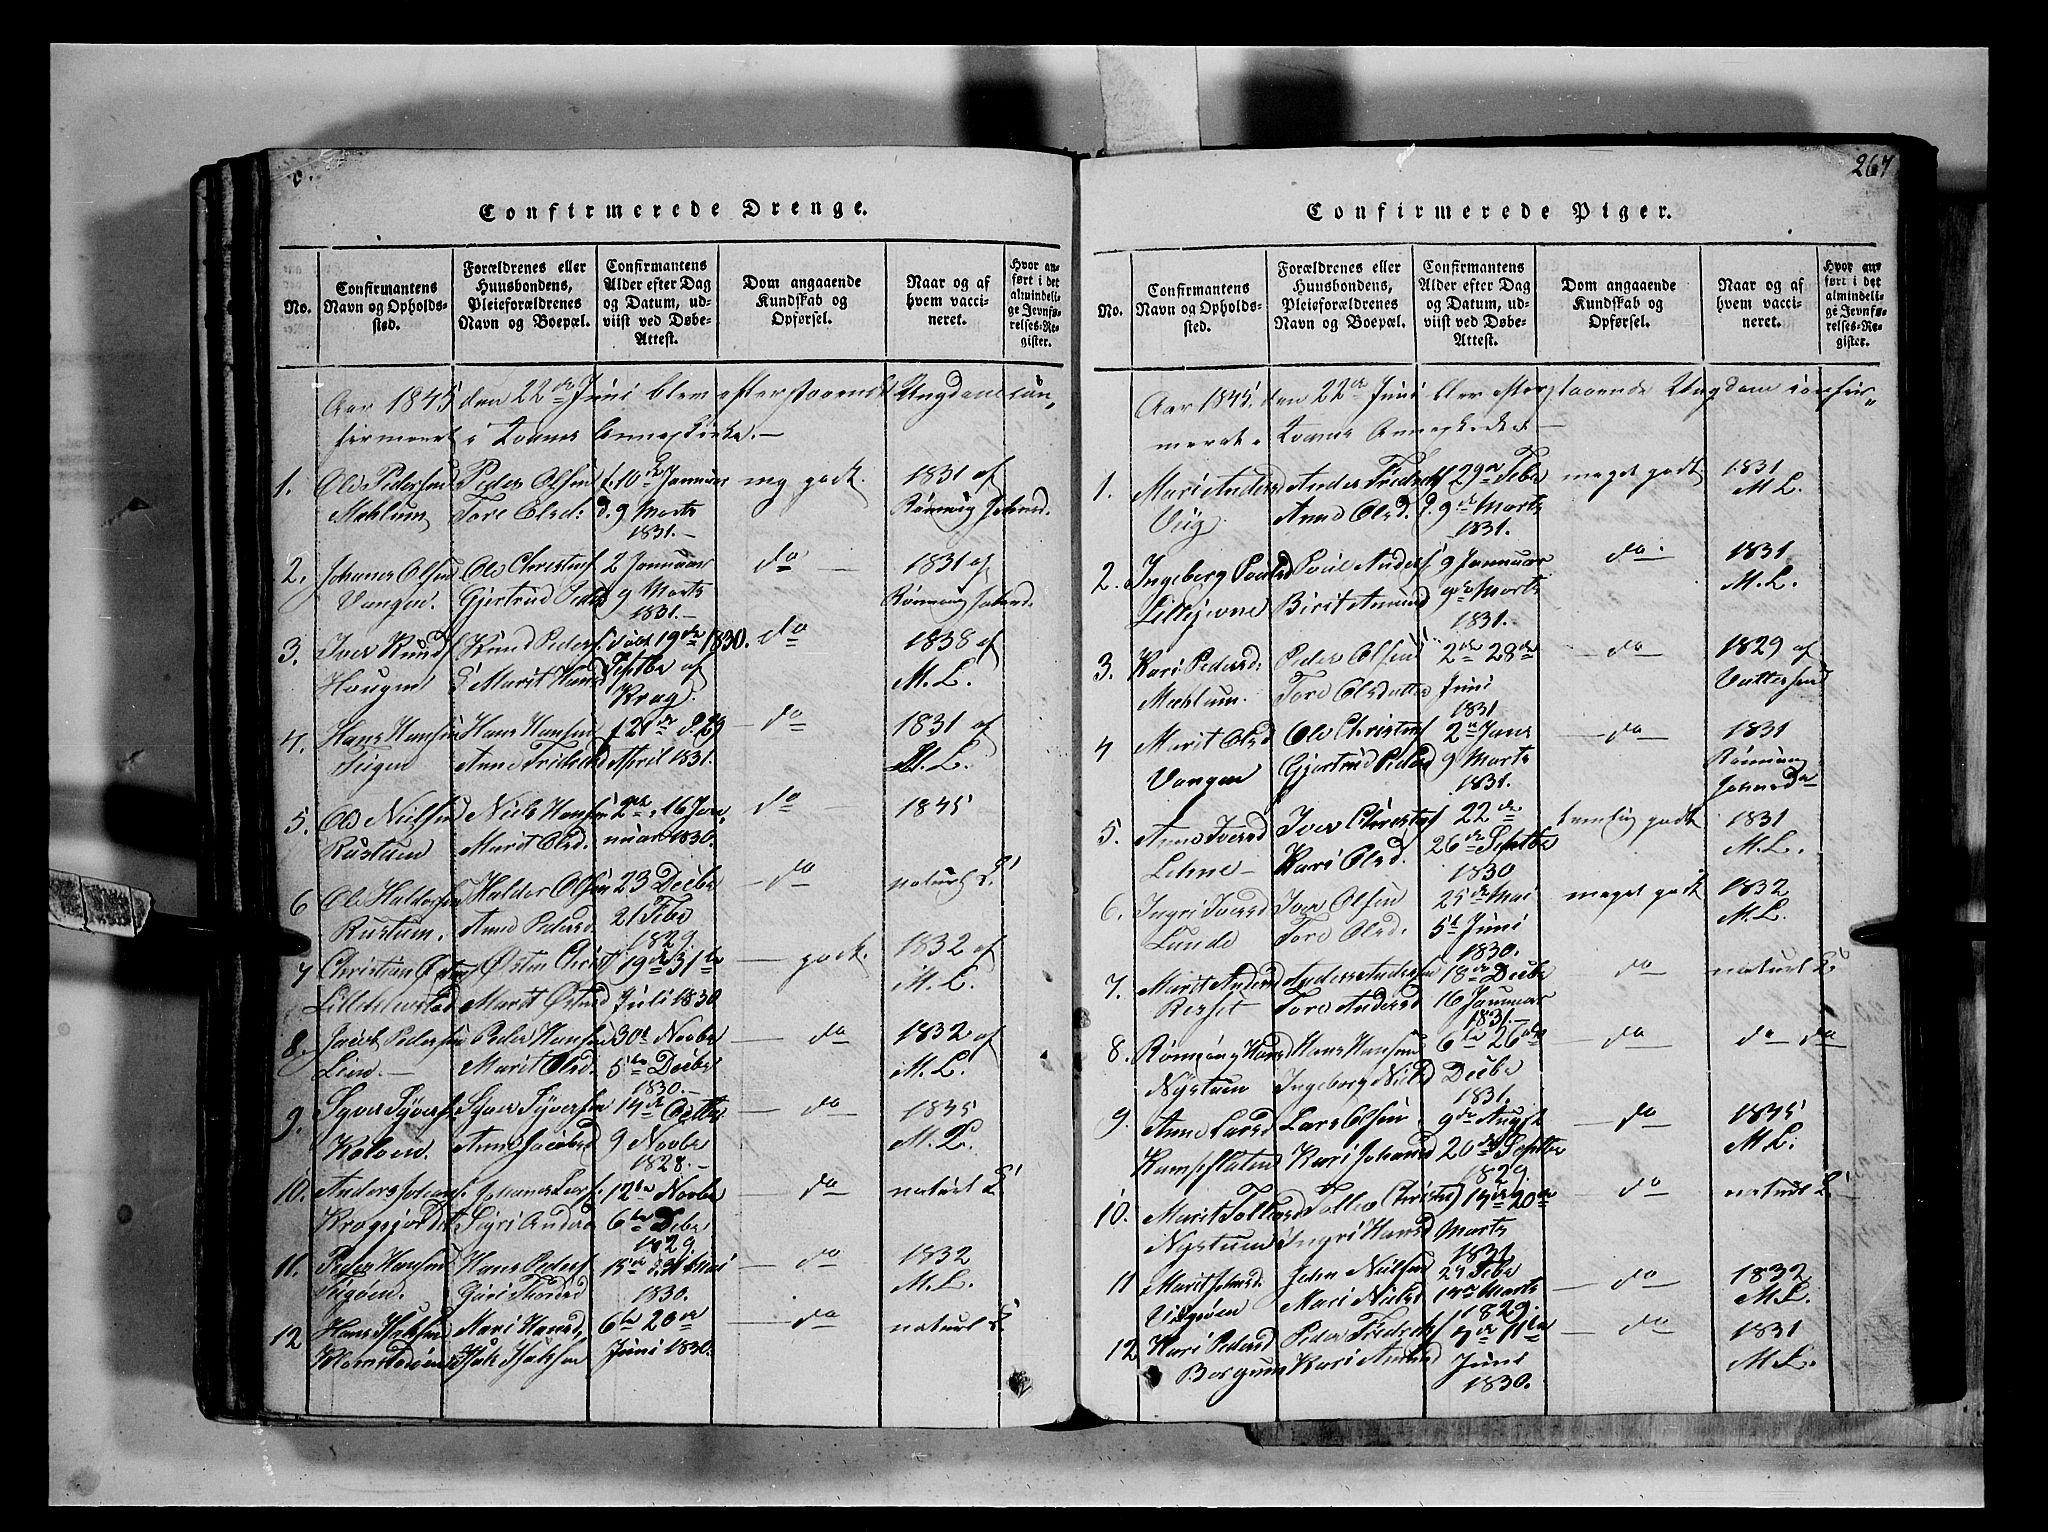 SAH, Fron prestekontor, H/Ha/Hab/L0002: Klokkerbok nr. 2, 1816-1850, s. 267